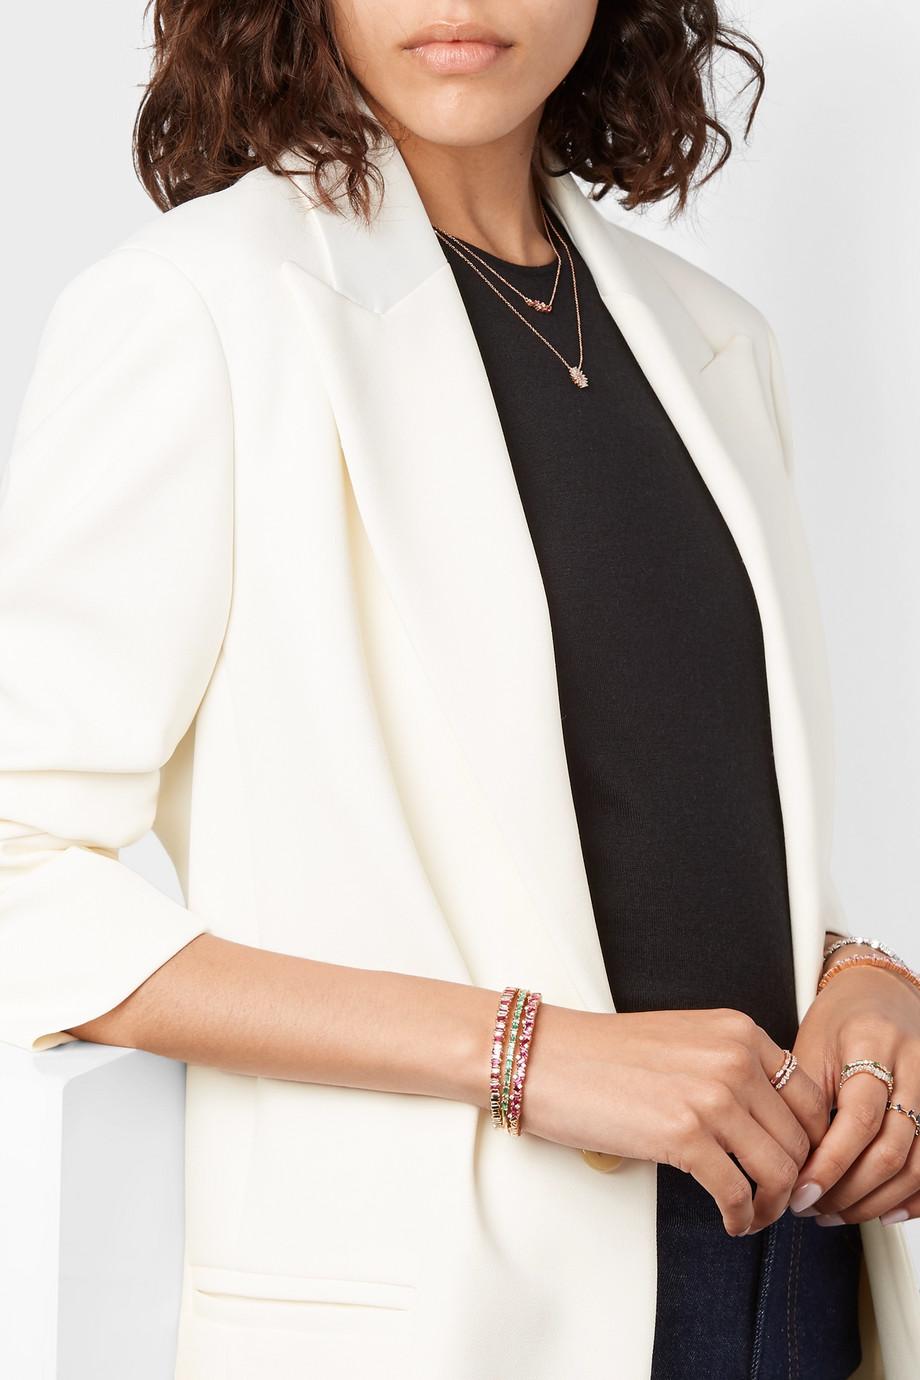 Suzanne Kalan 18-karat rose gold, ruby and diamond cuff